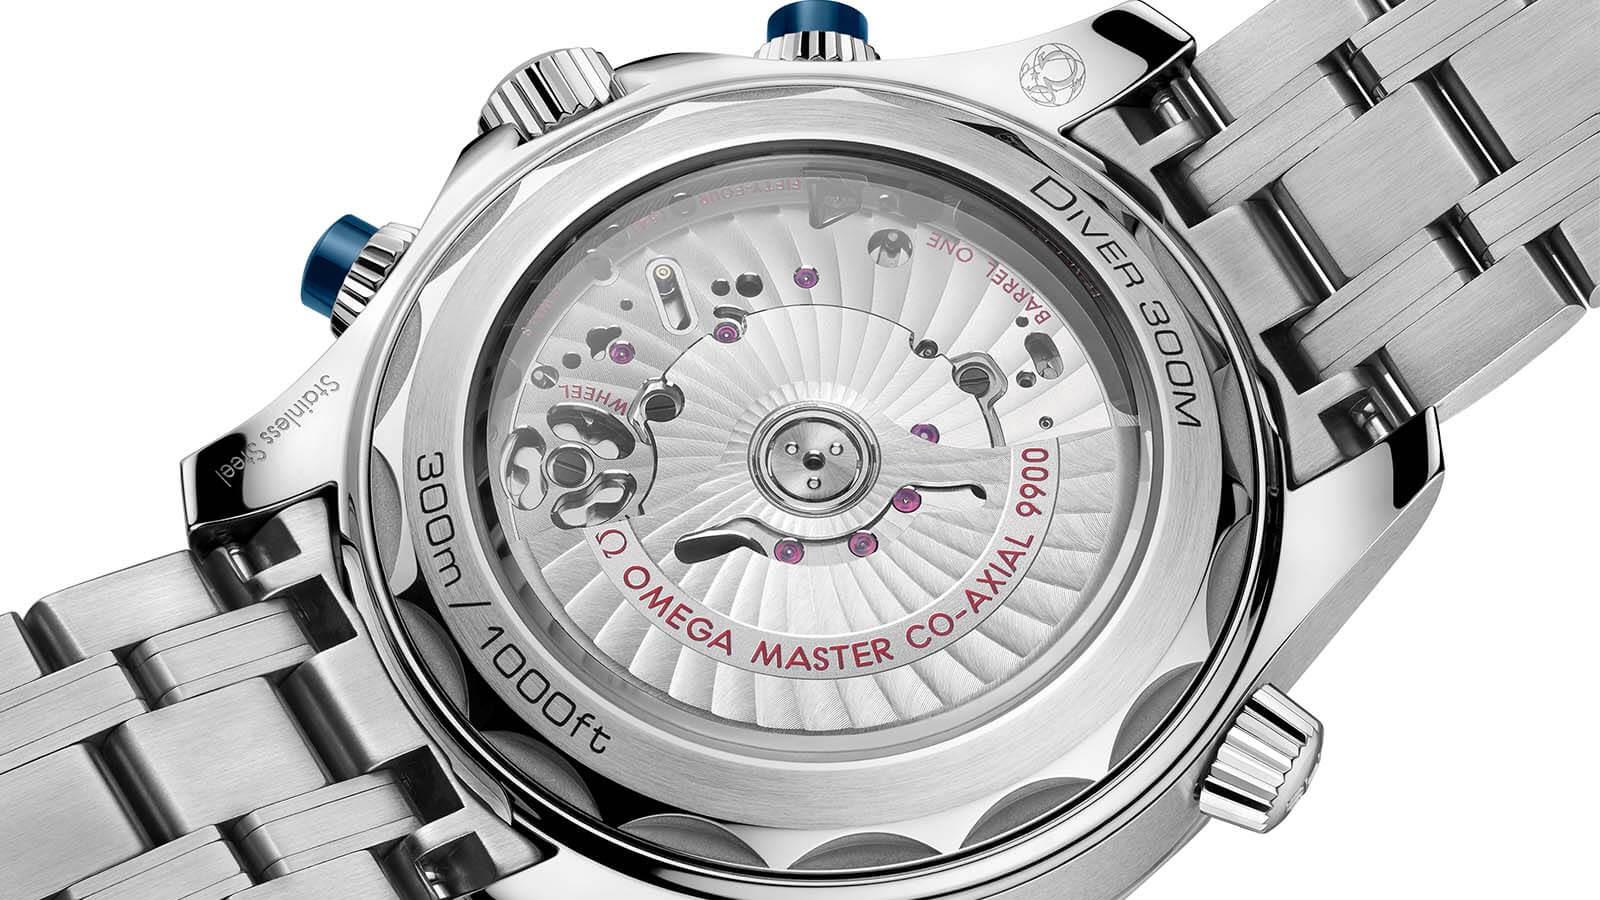 Kaliber 9900 in der neuen OMEGA Seamaster Diver 300M Chronograph